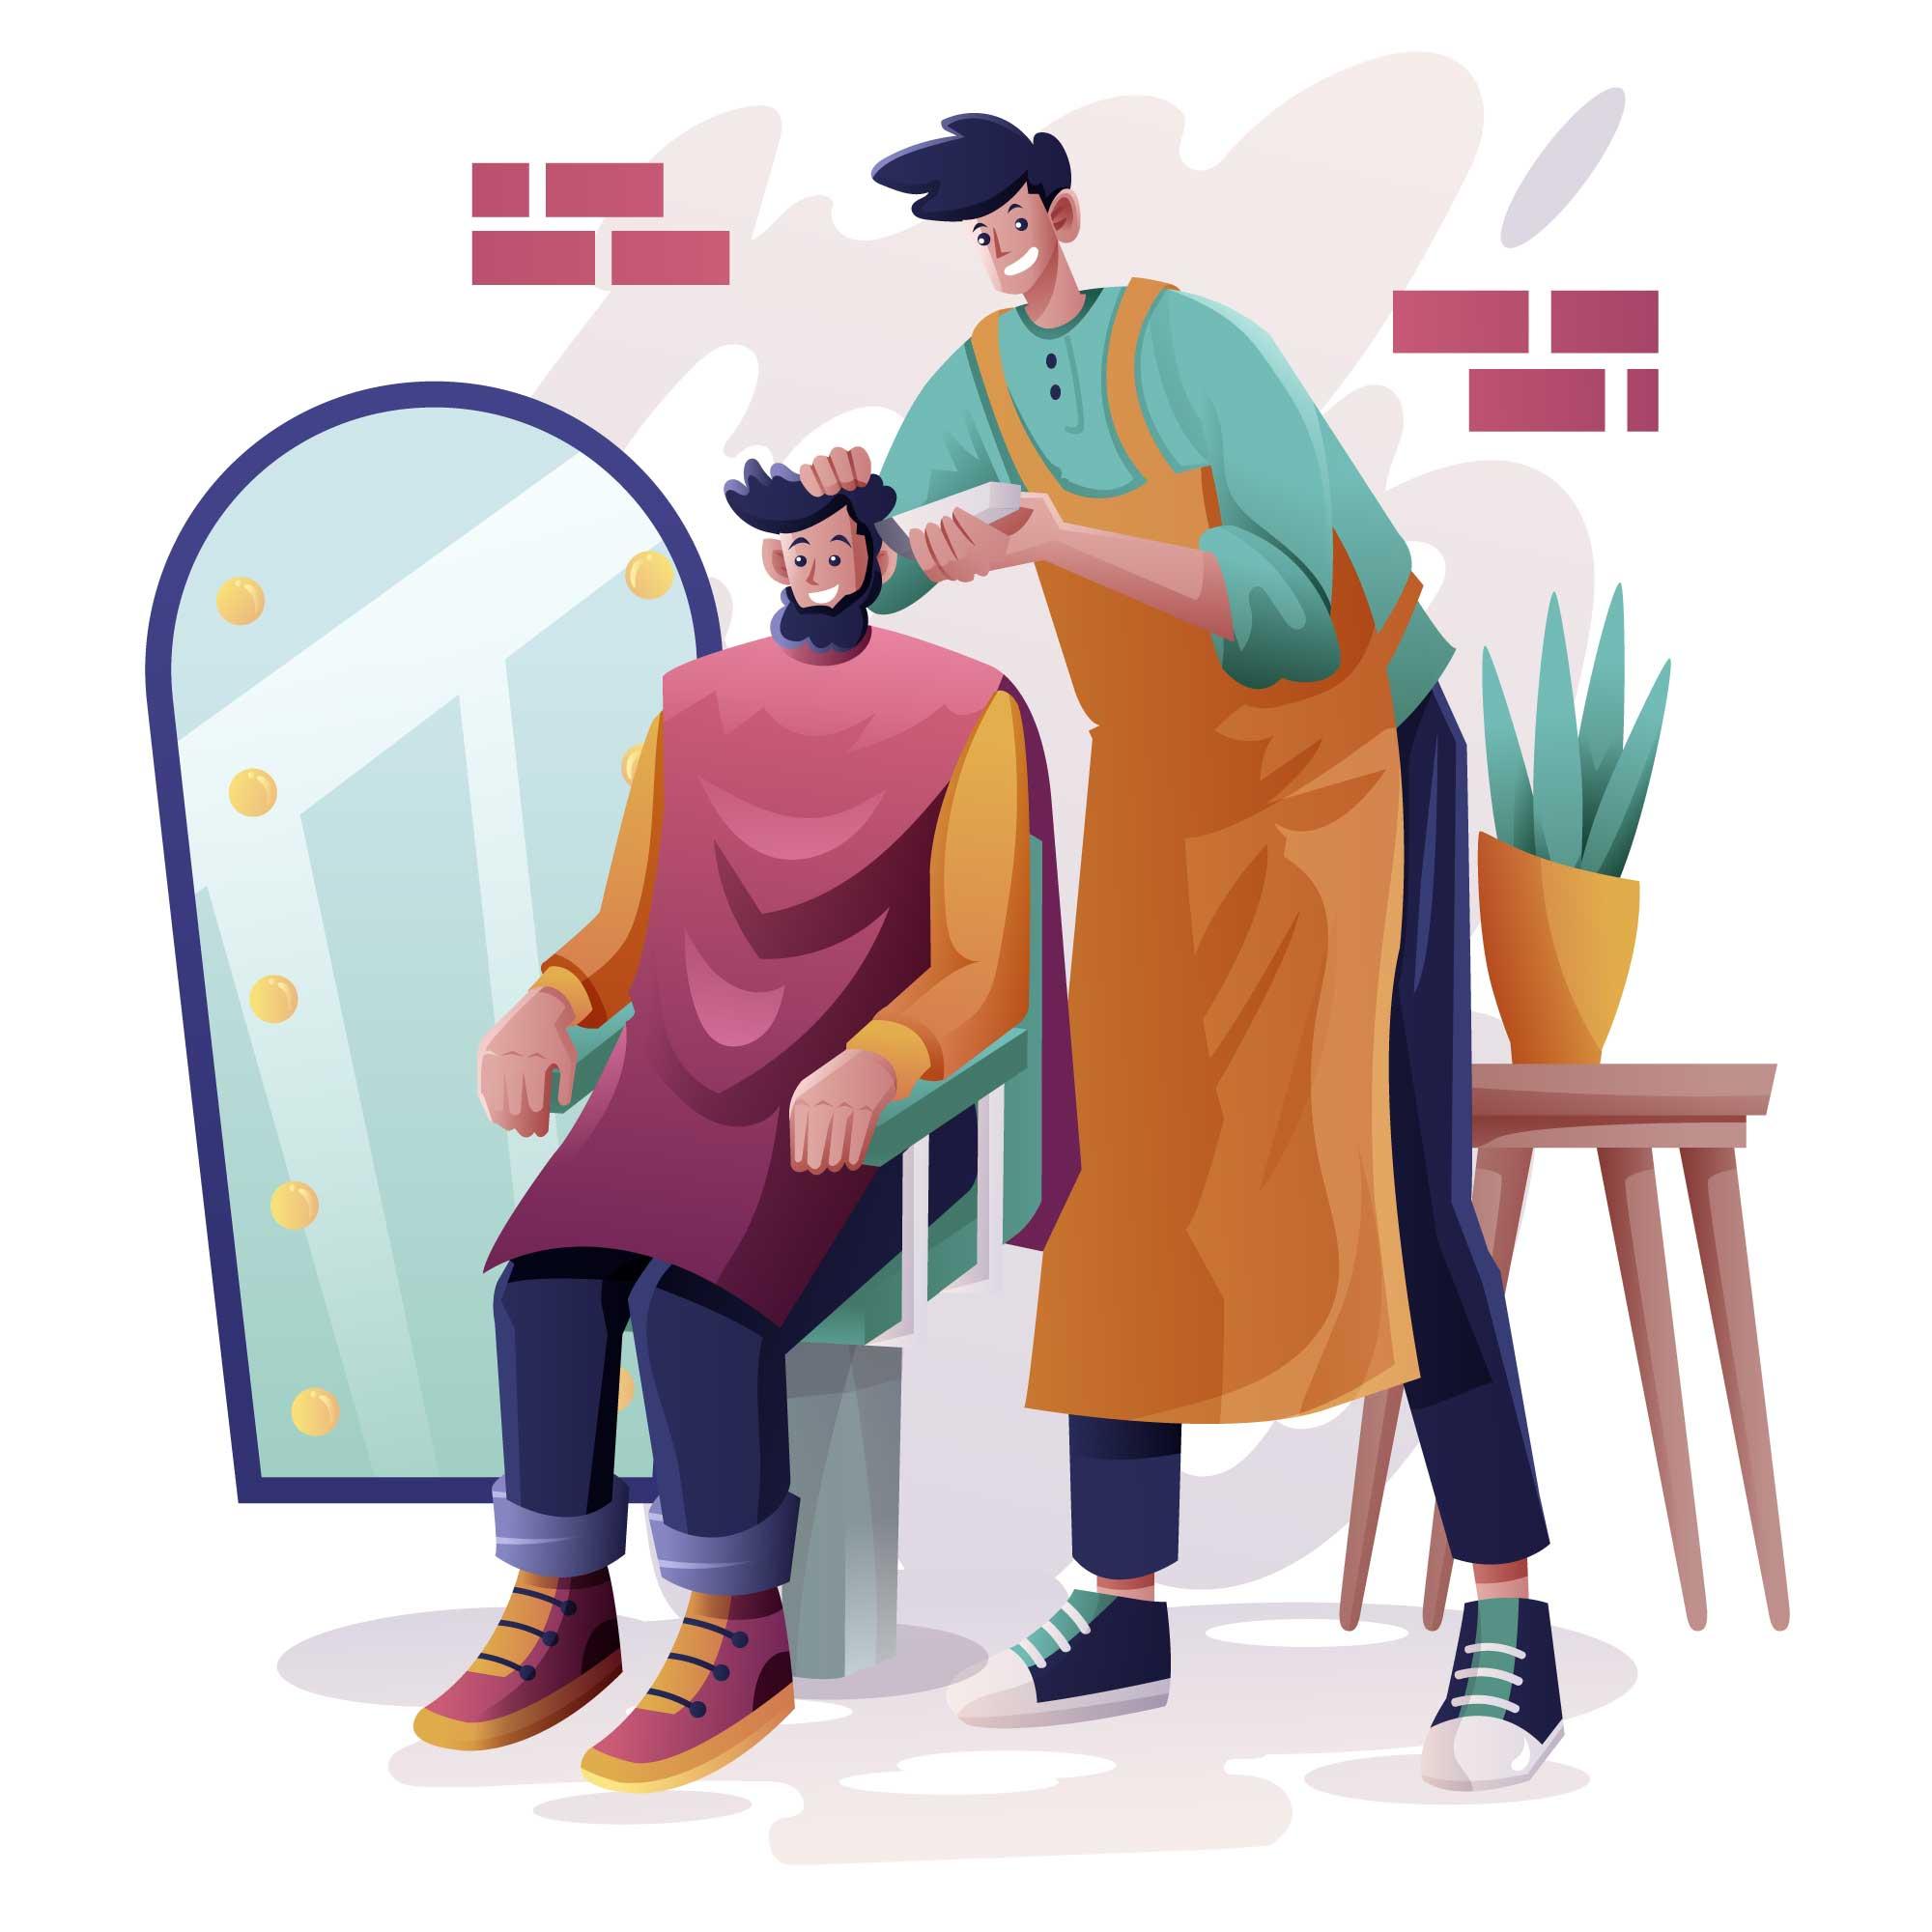 Barber Vector Illustration